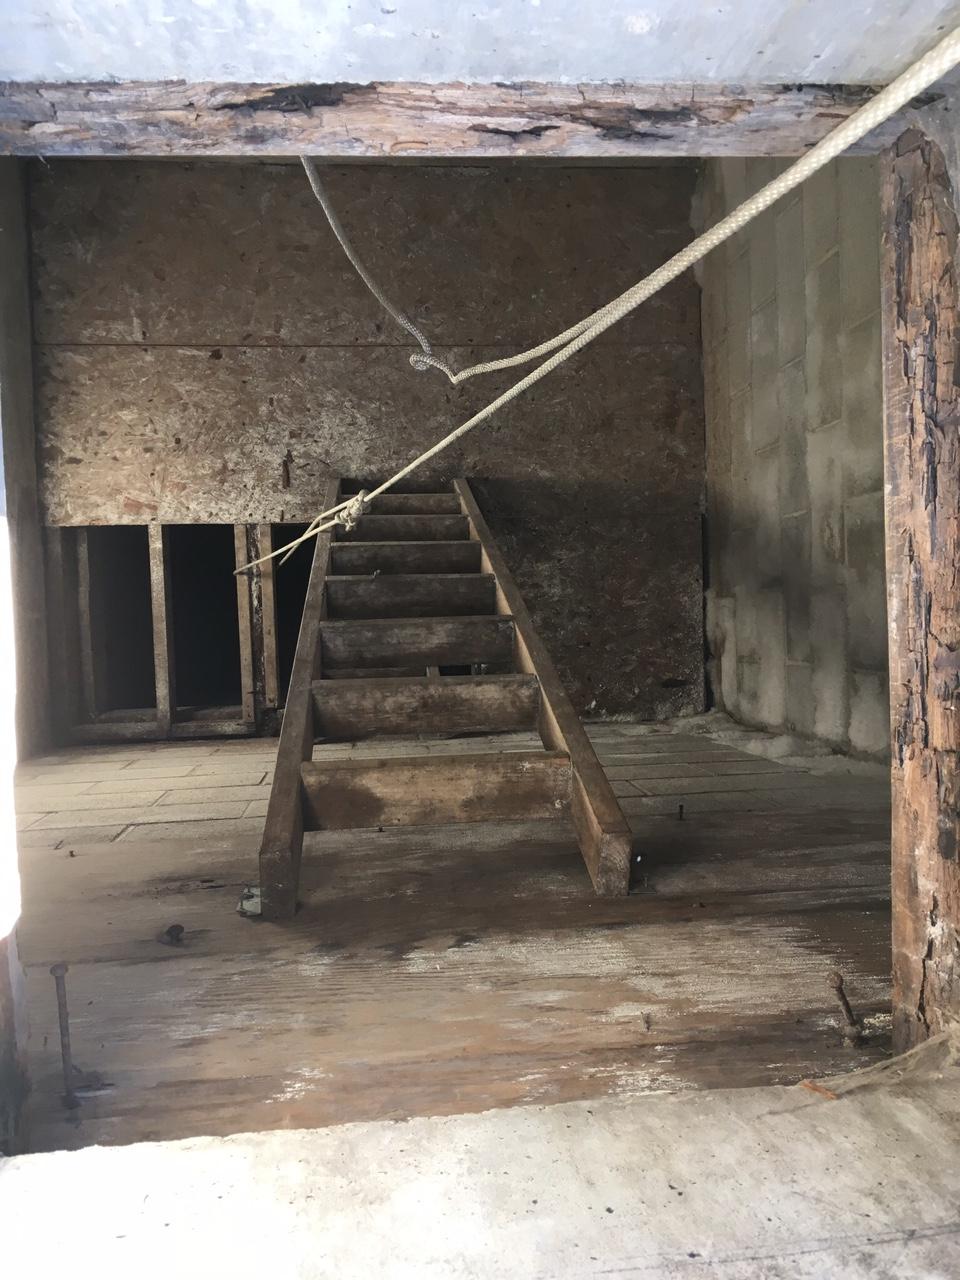 The horrific ascent ladder